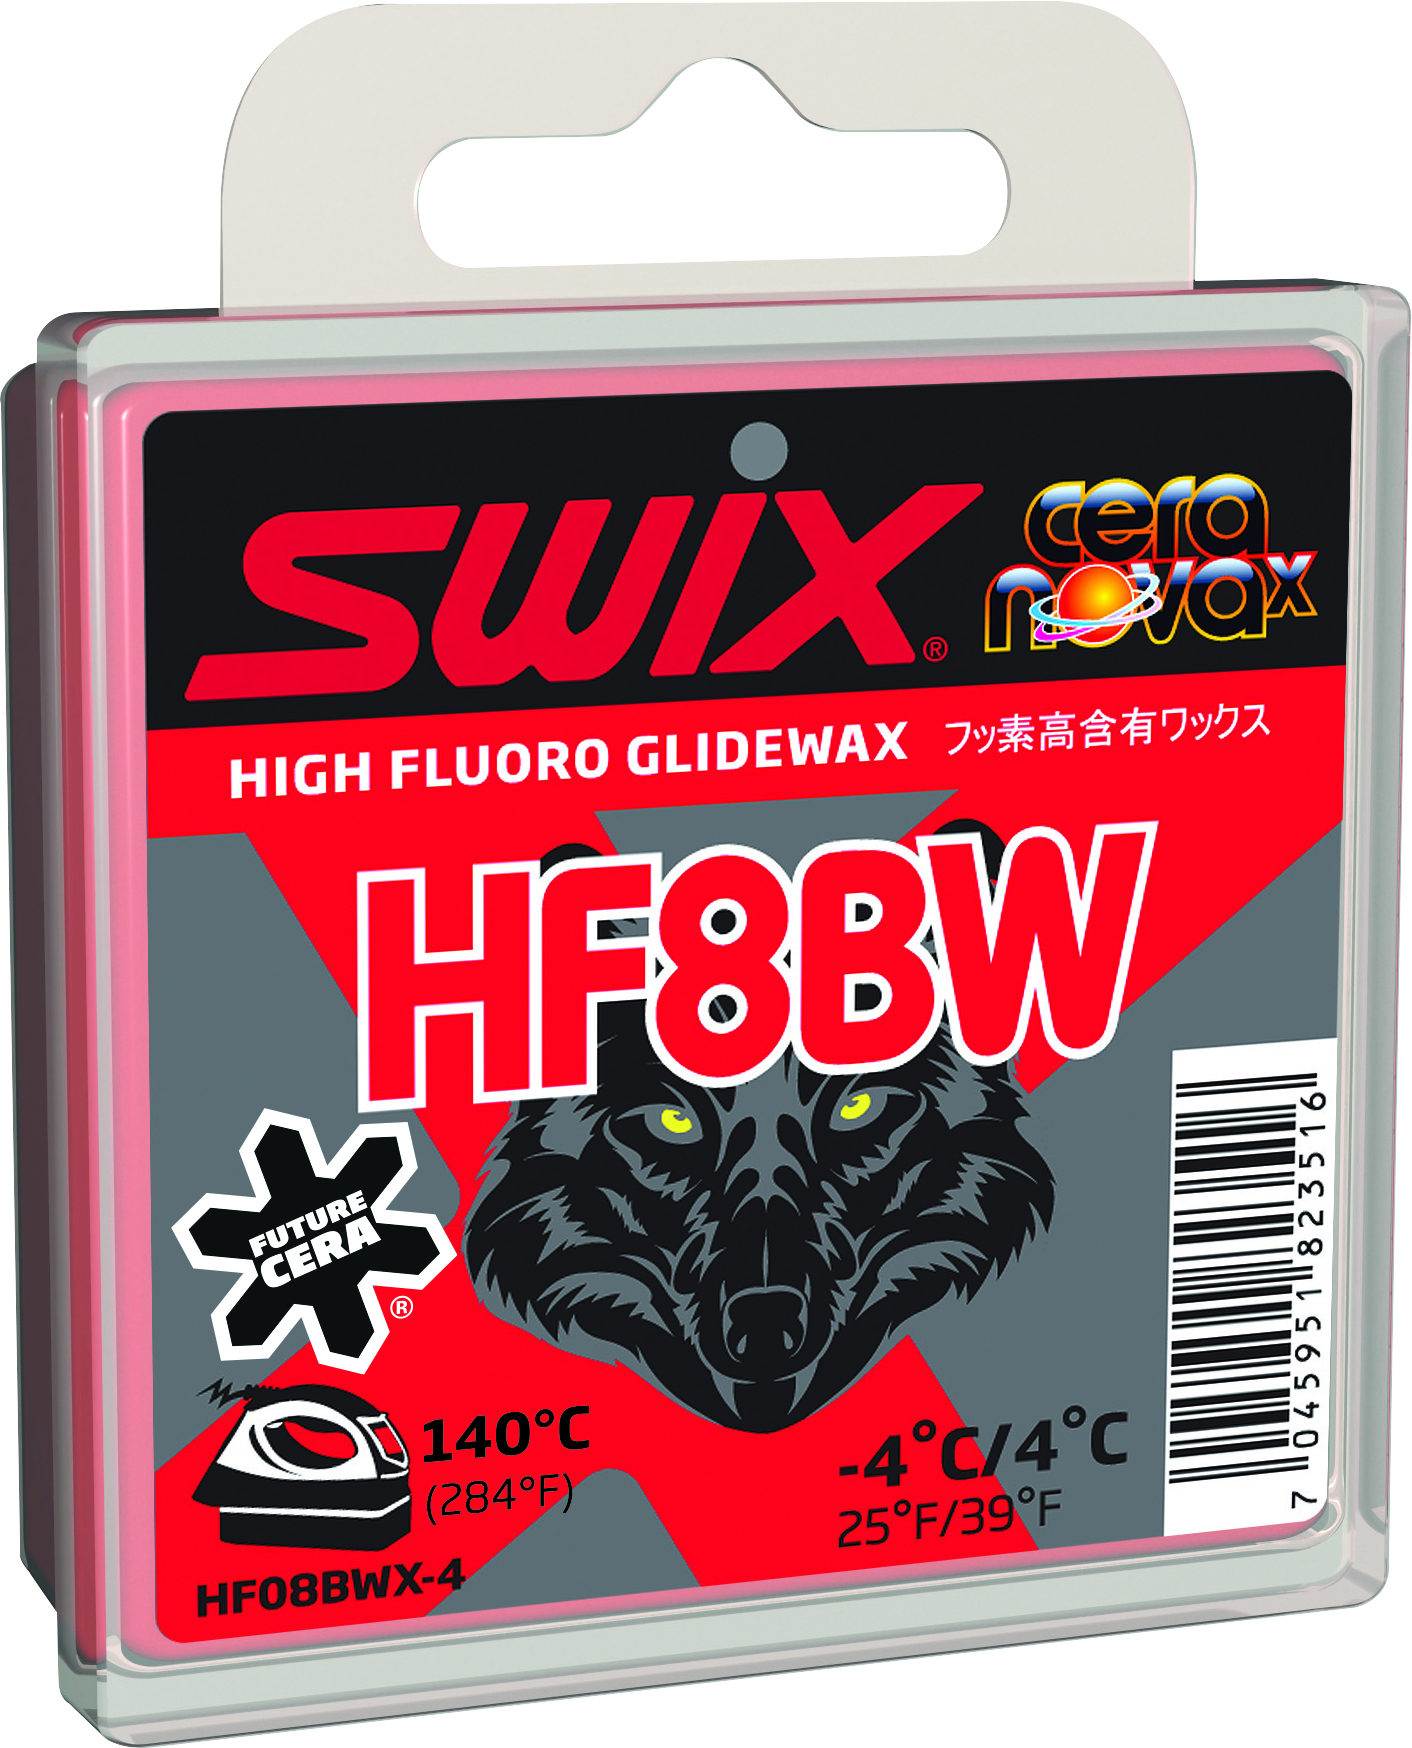 Swix Мазь скольжения Swix HF8BW, +4C/-4C все цены